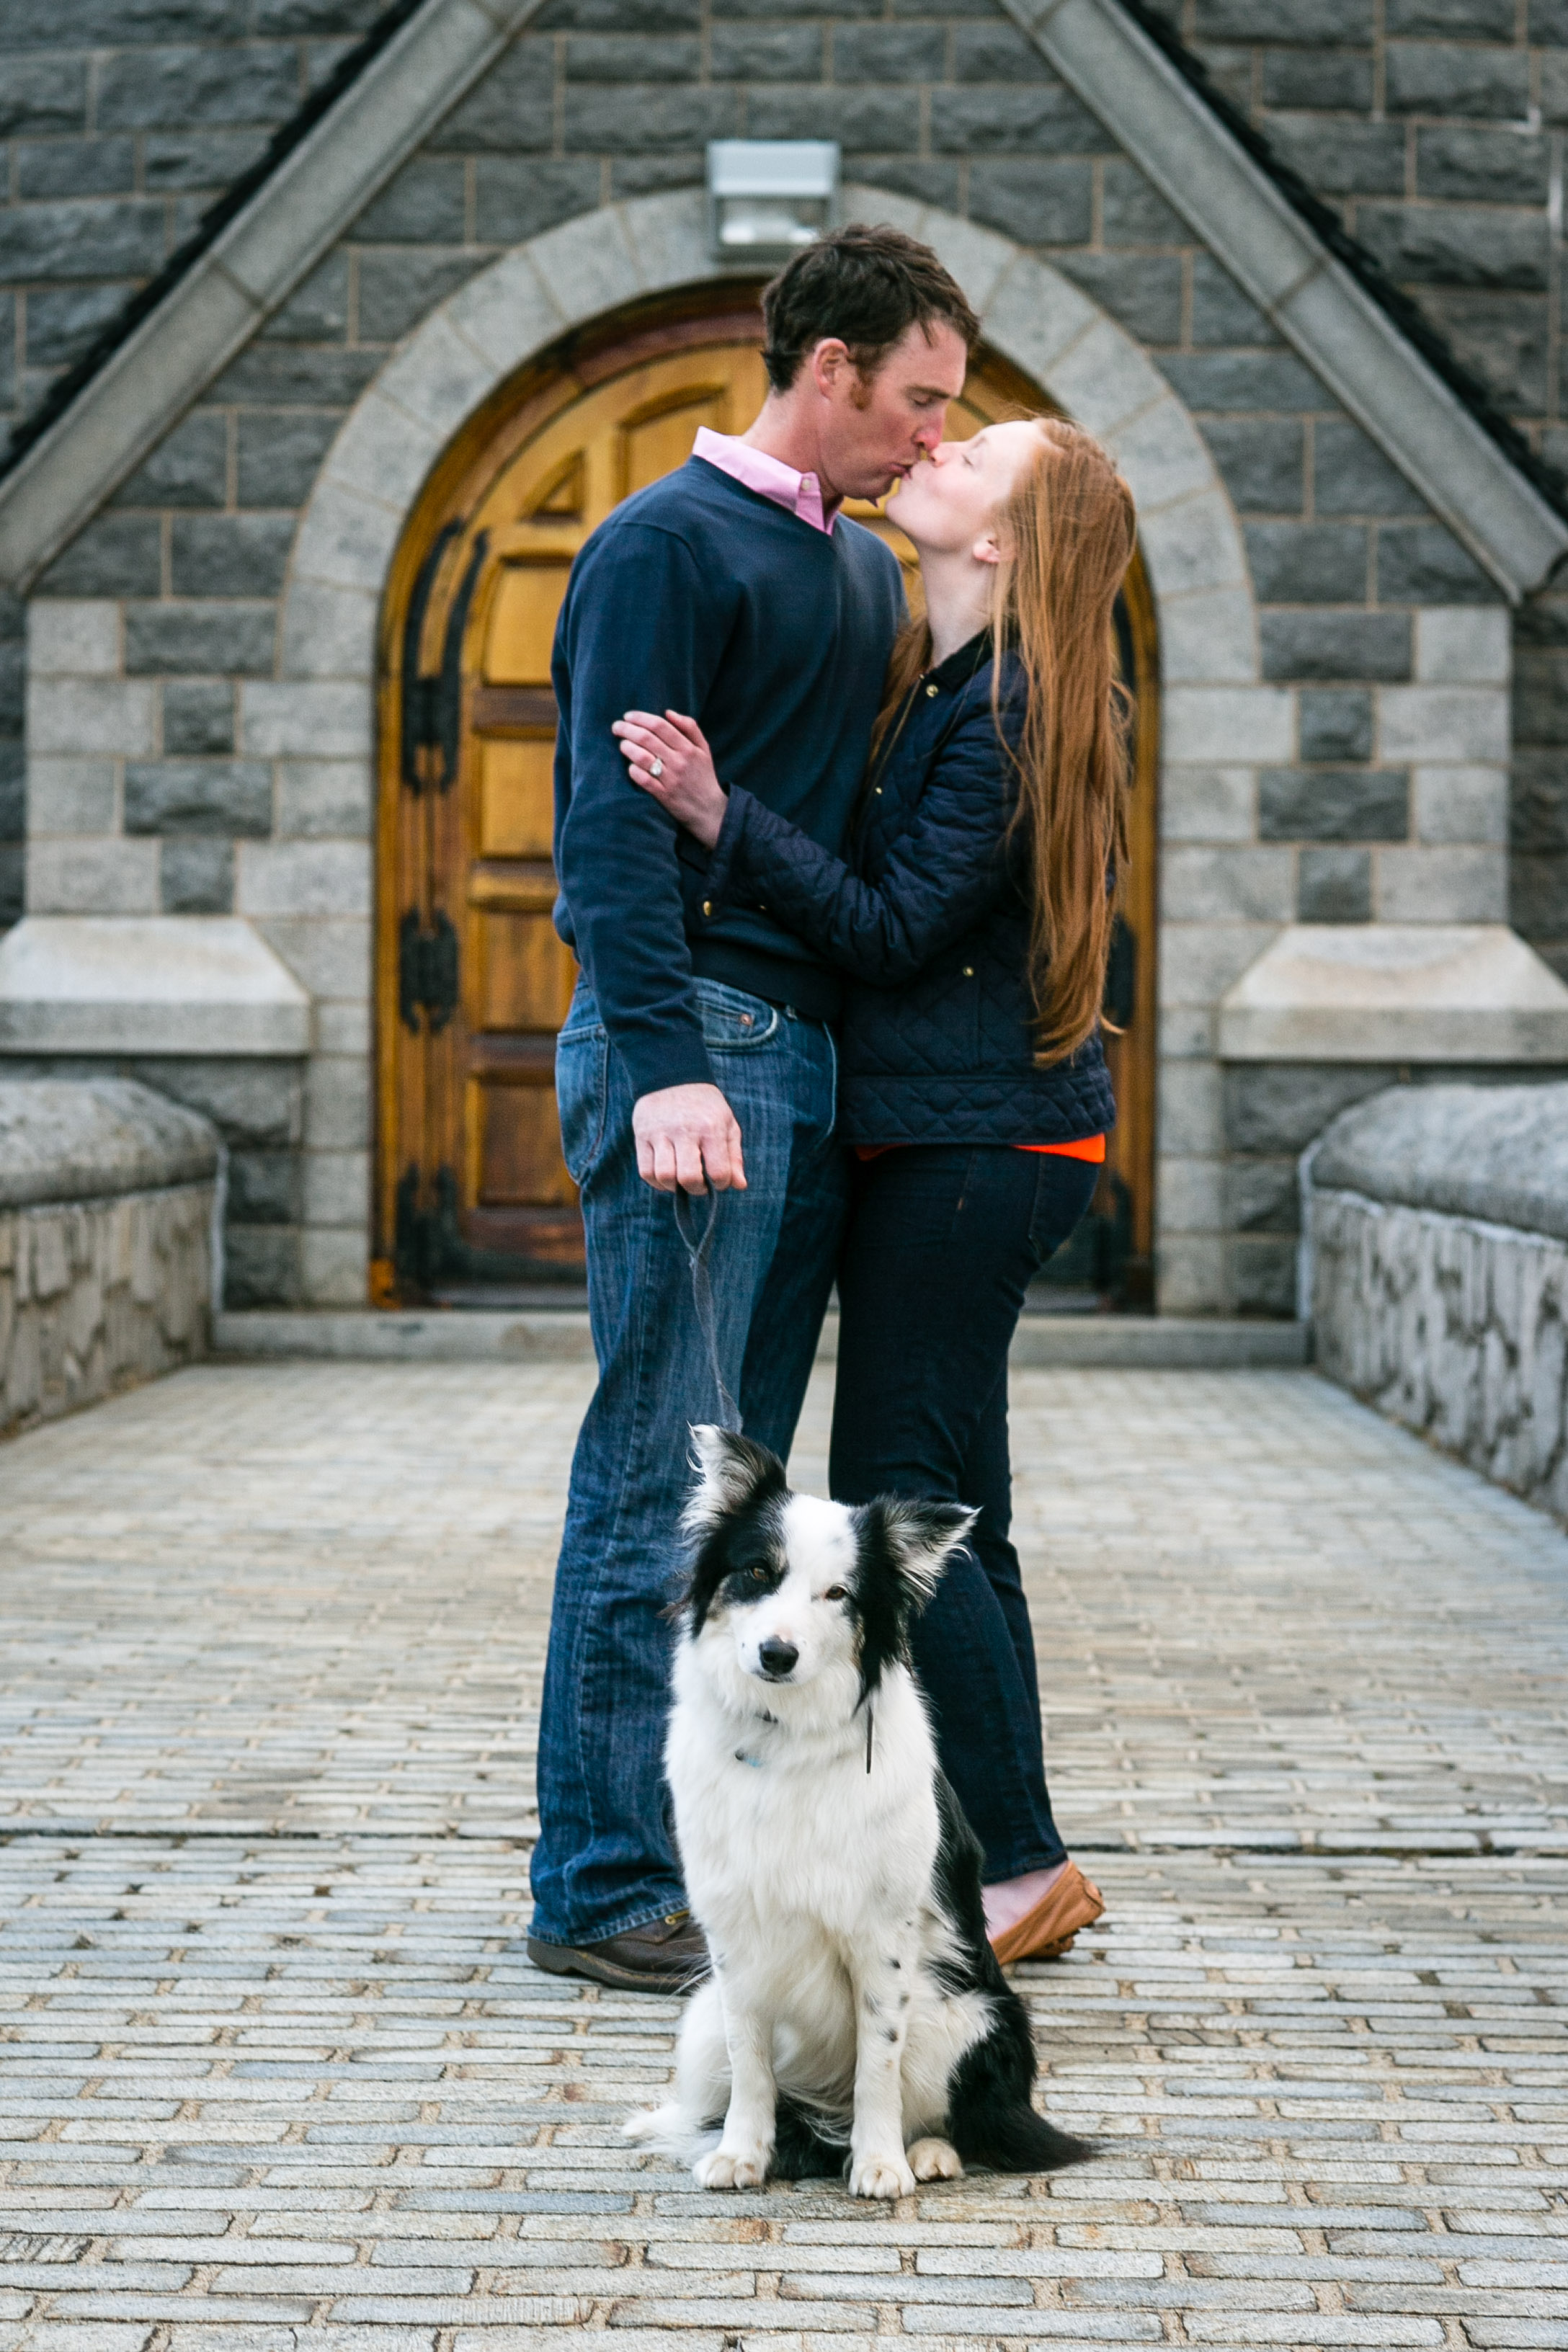 Romantic-Engagement-Poto-Session-Photography-by-Jacek-Dolata-CT-MA-RI-NJ-NYC-NY-VT-NH-PA-6.jpg